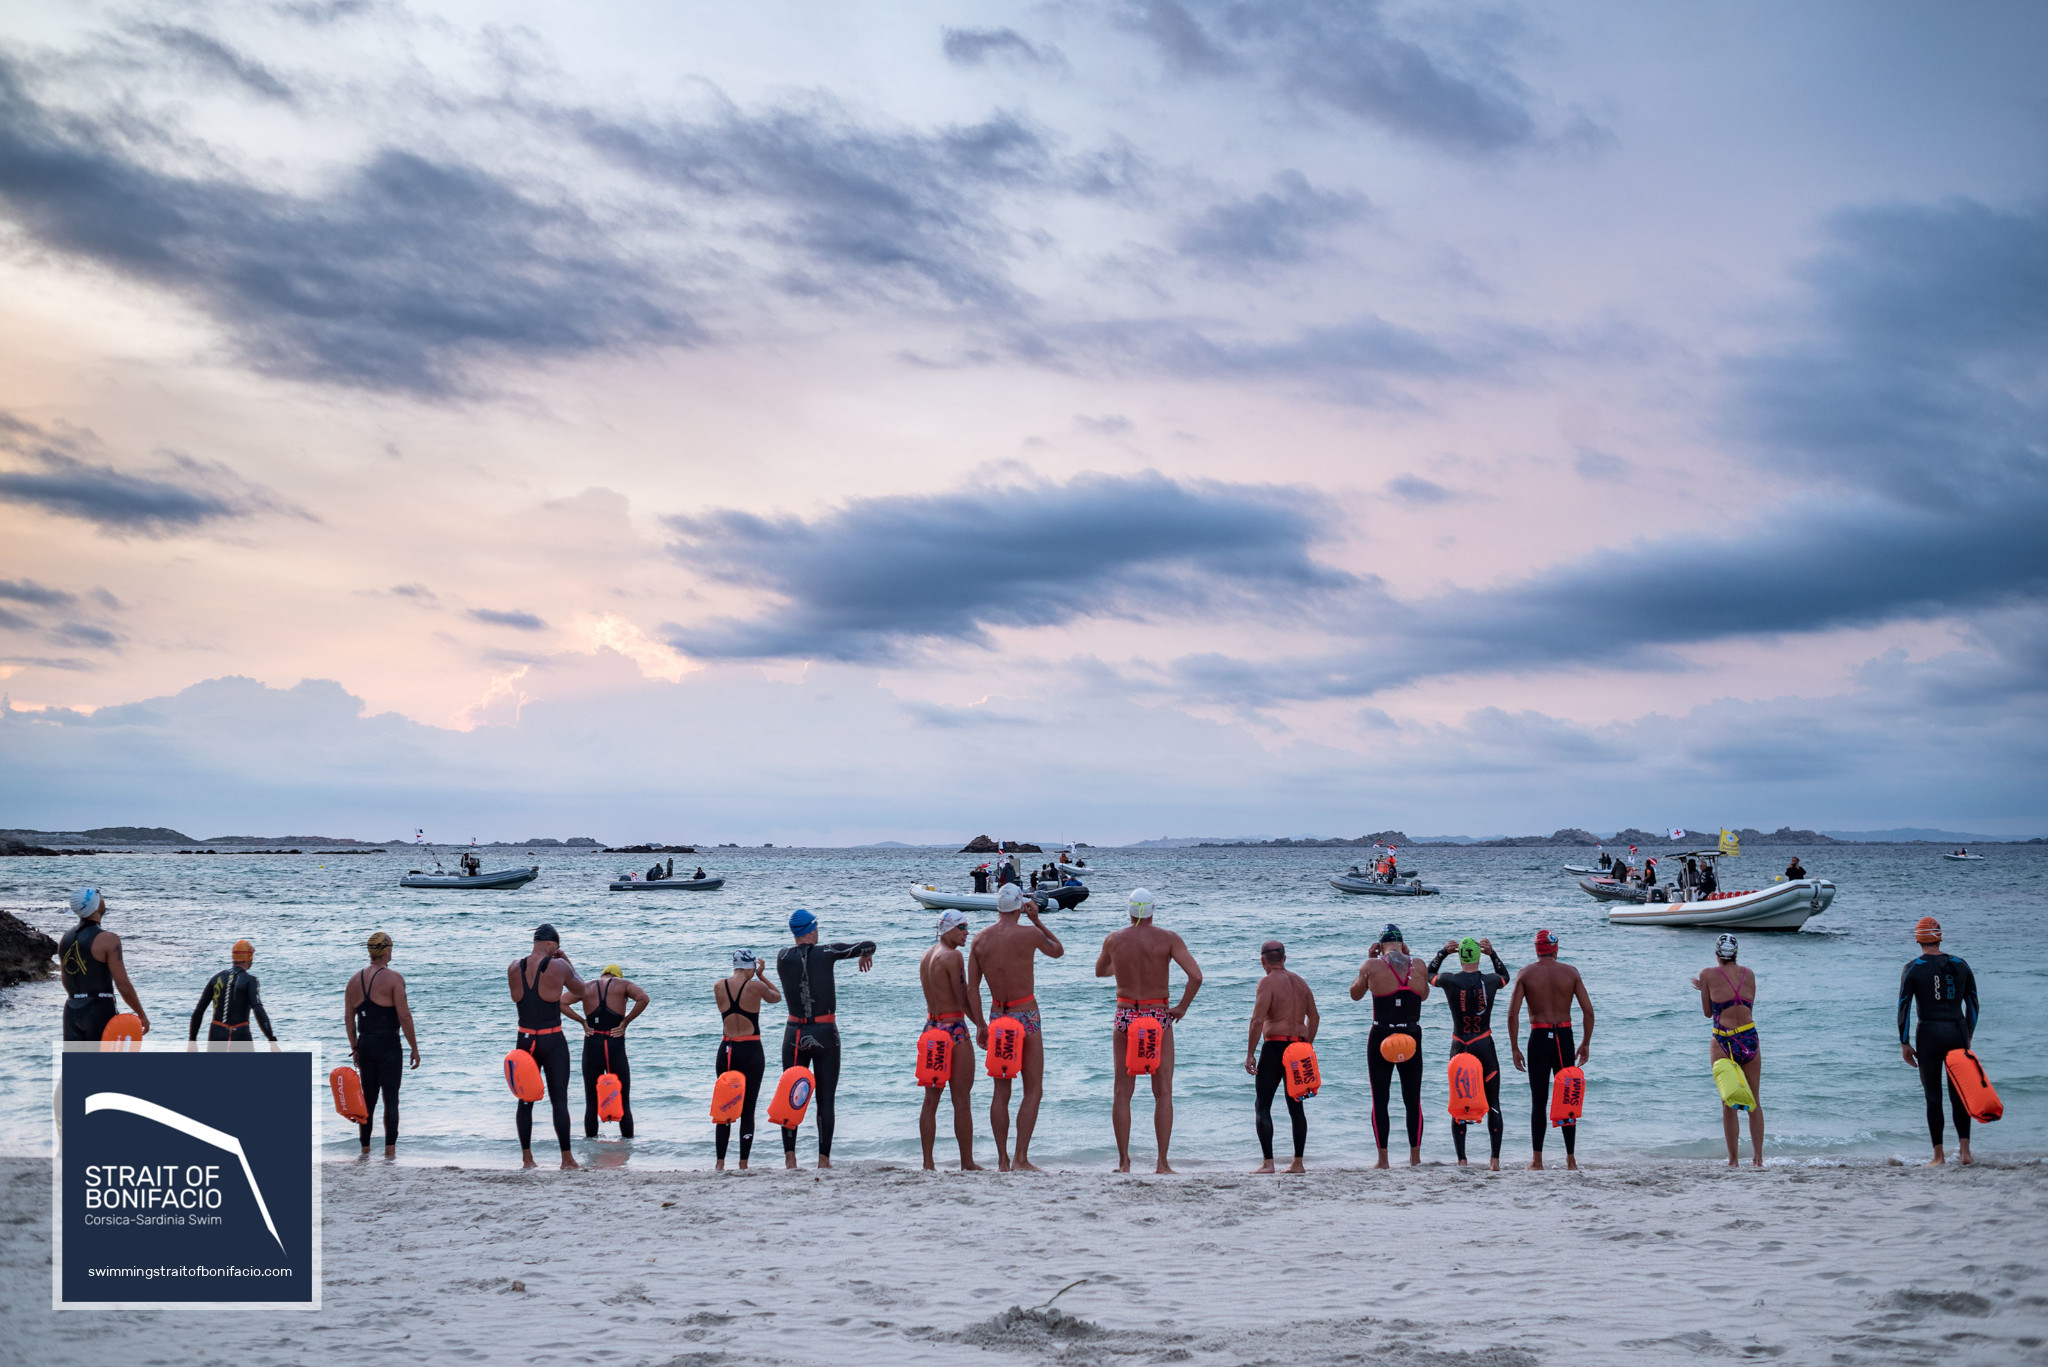 Strait of Bonifacio Swim Crossing 2019